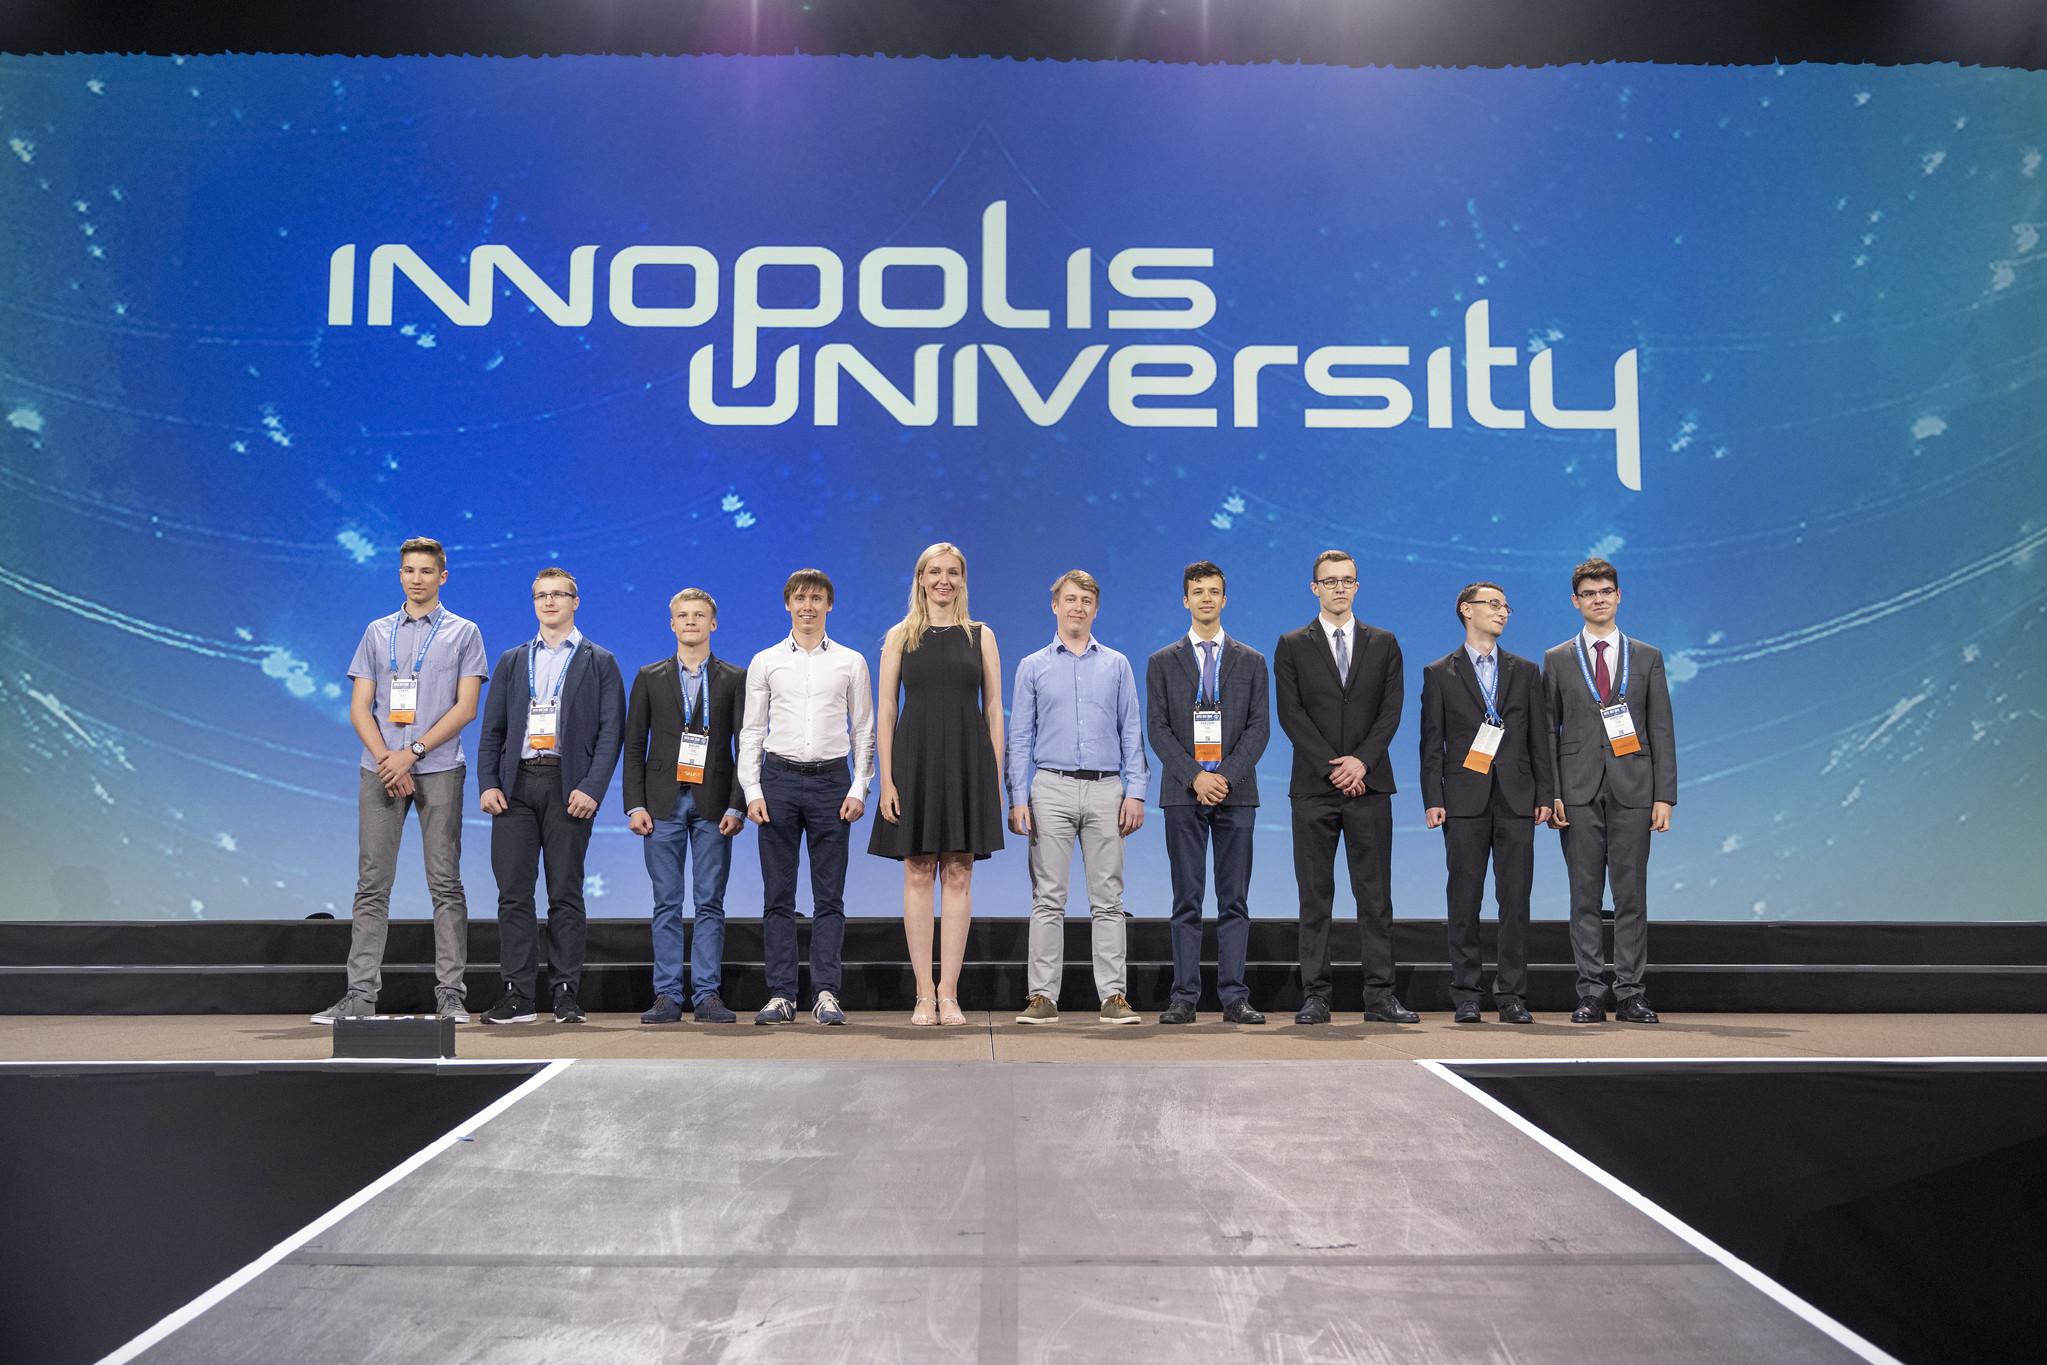 20190517_INNOPOLIS UNIVERSITY_0005_CA